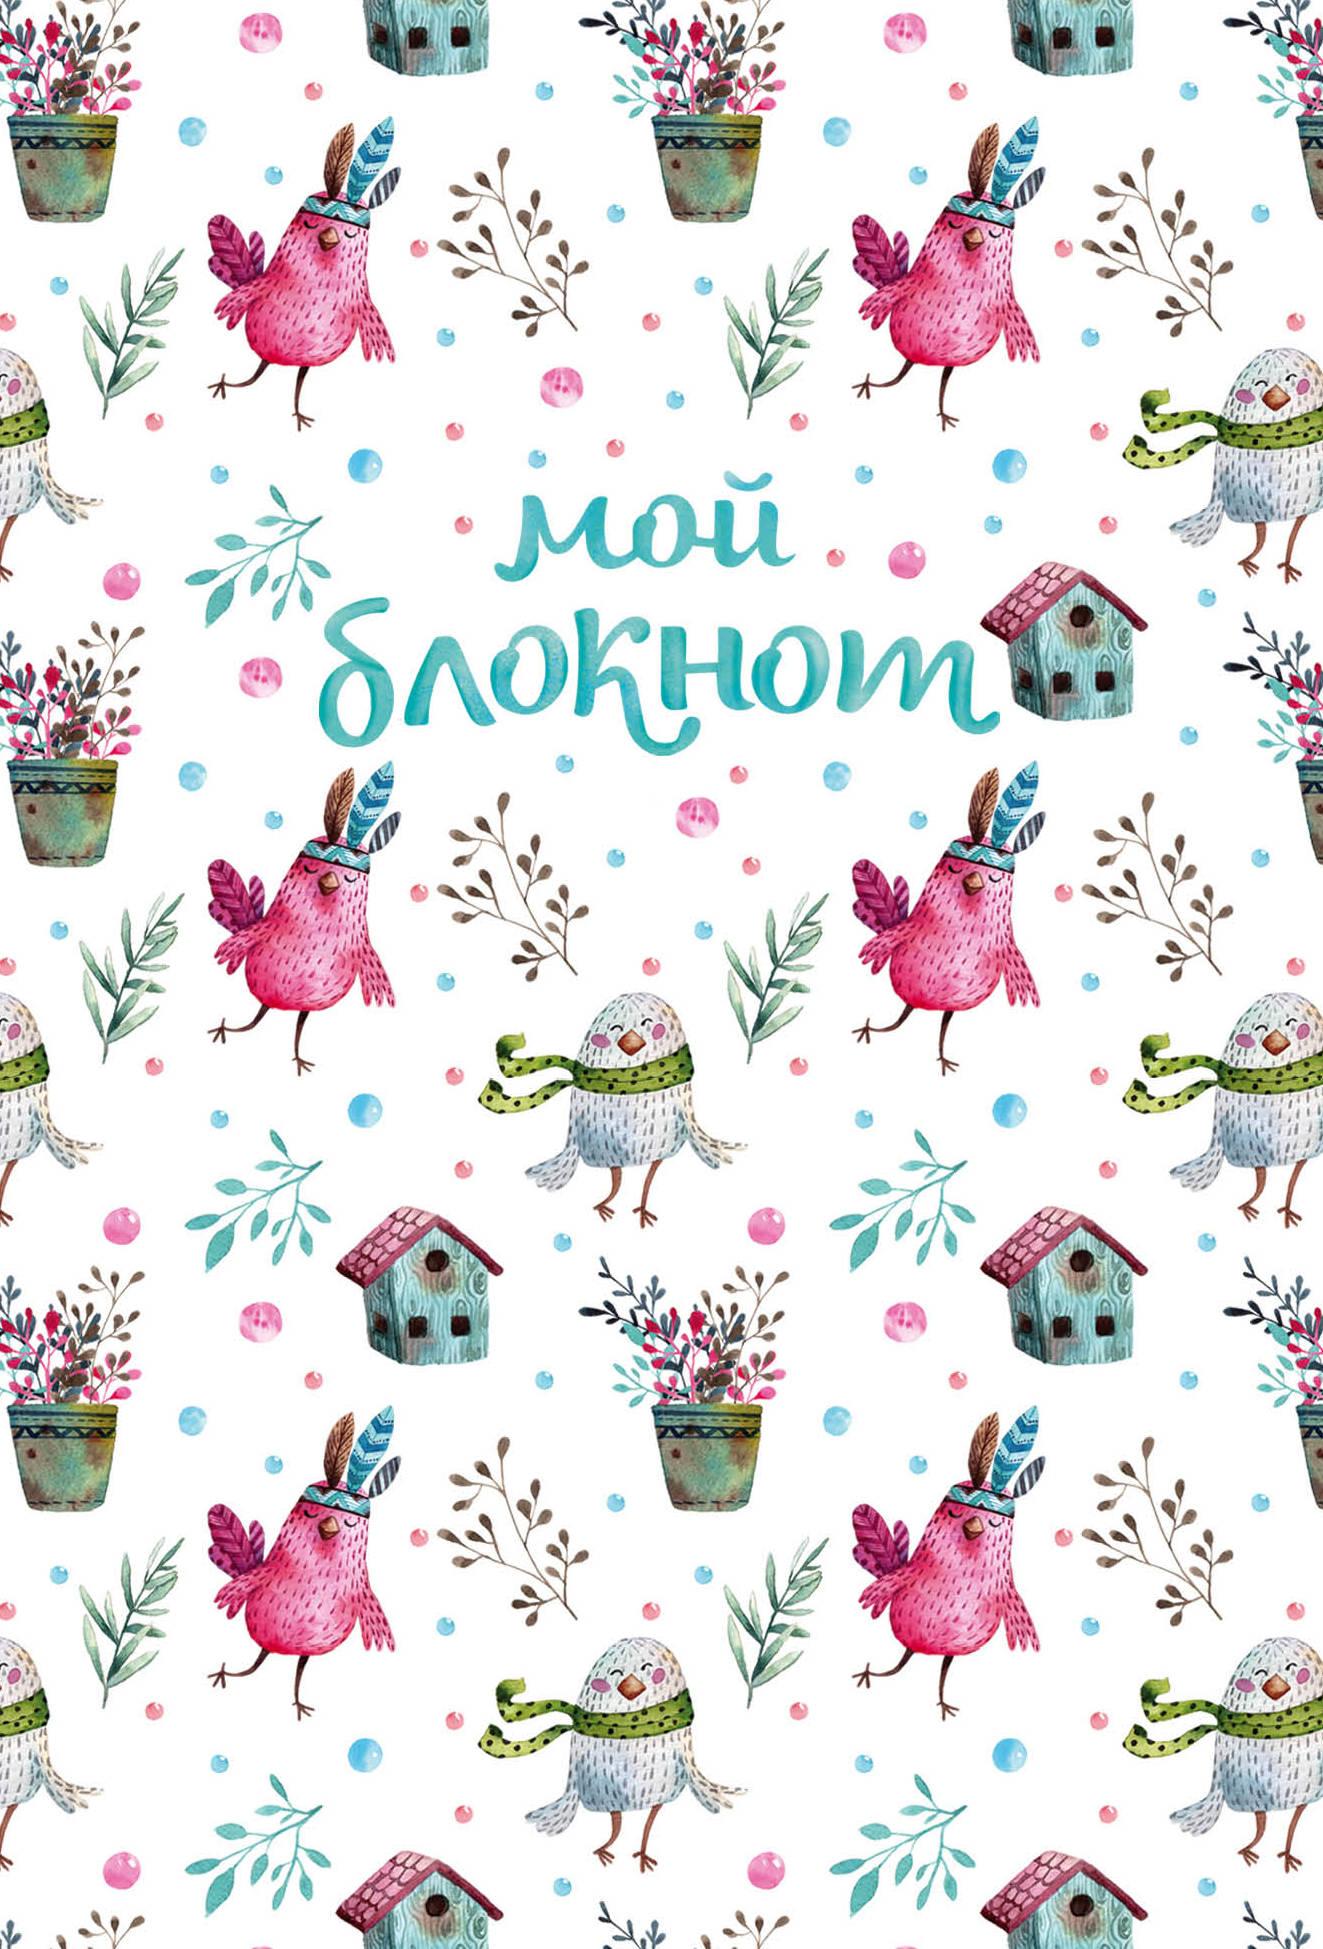 М. А. Ступак Мой блокнот. Певчие птички от @mashamashastu (паттерн) м а ступак певчие птички от mashamashastu мой блокнот зеленый